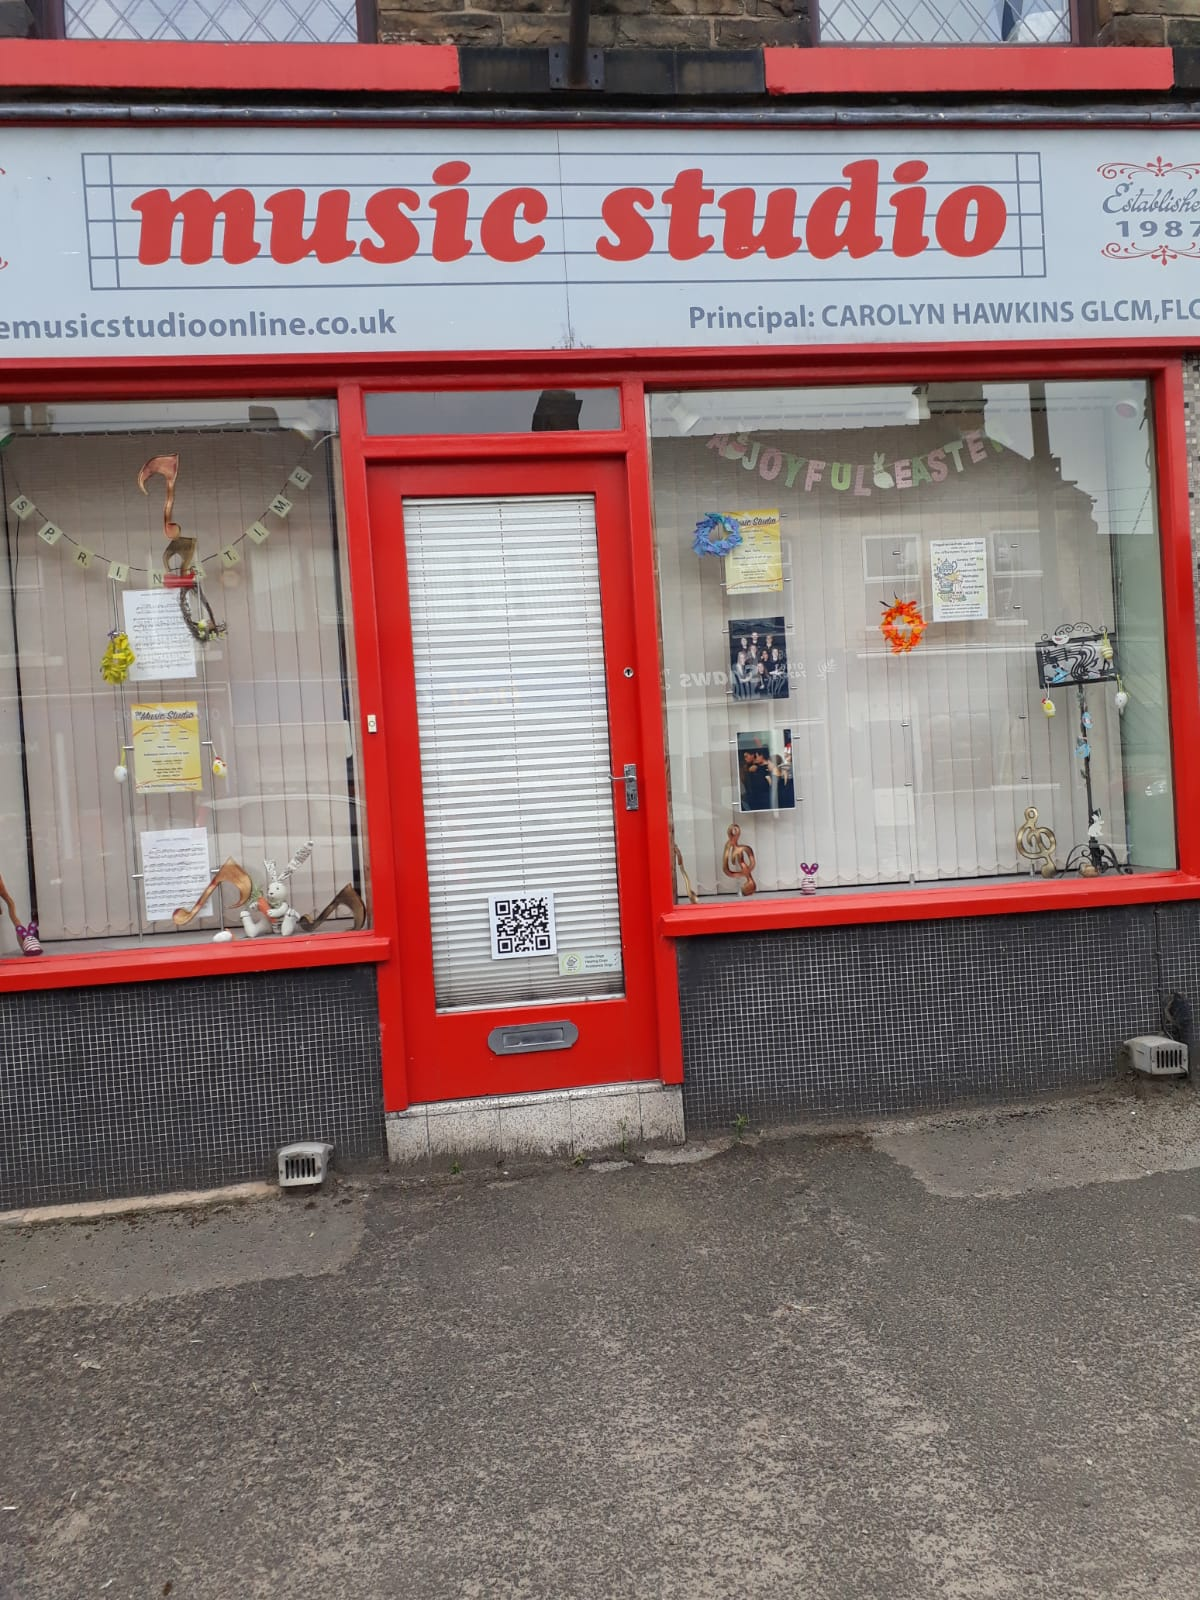 40. Music Studio